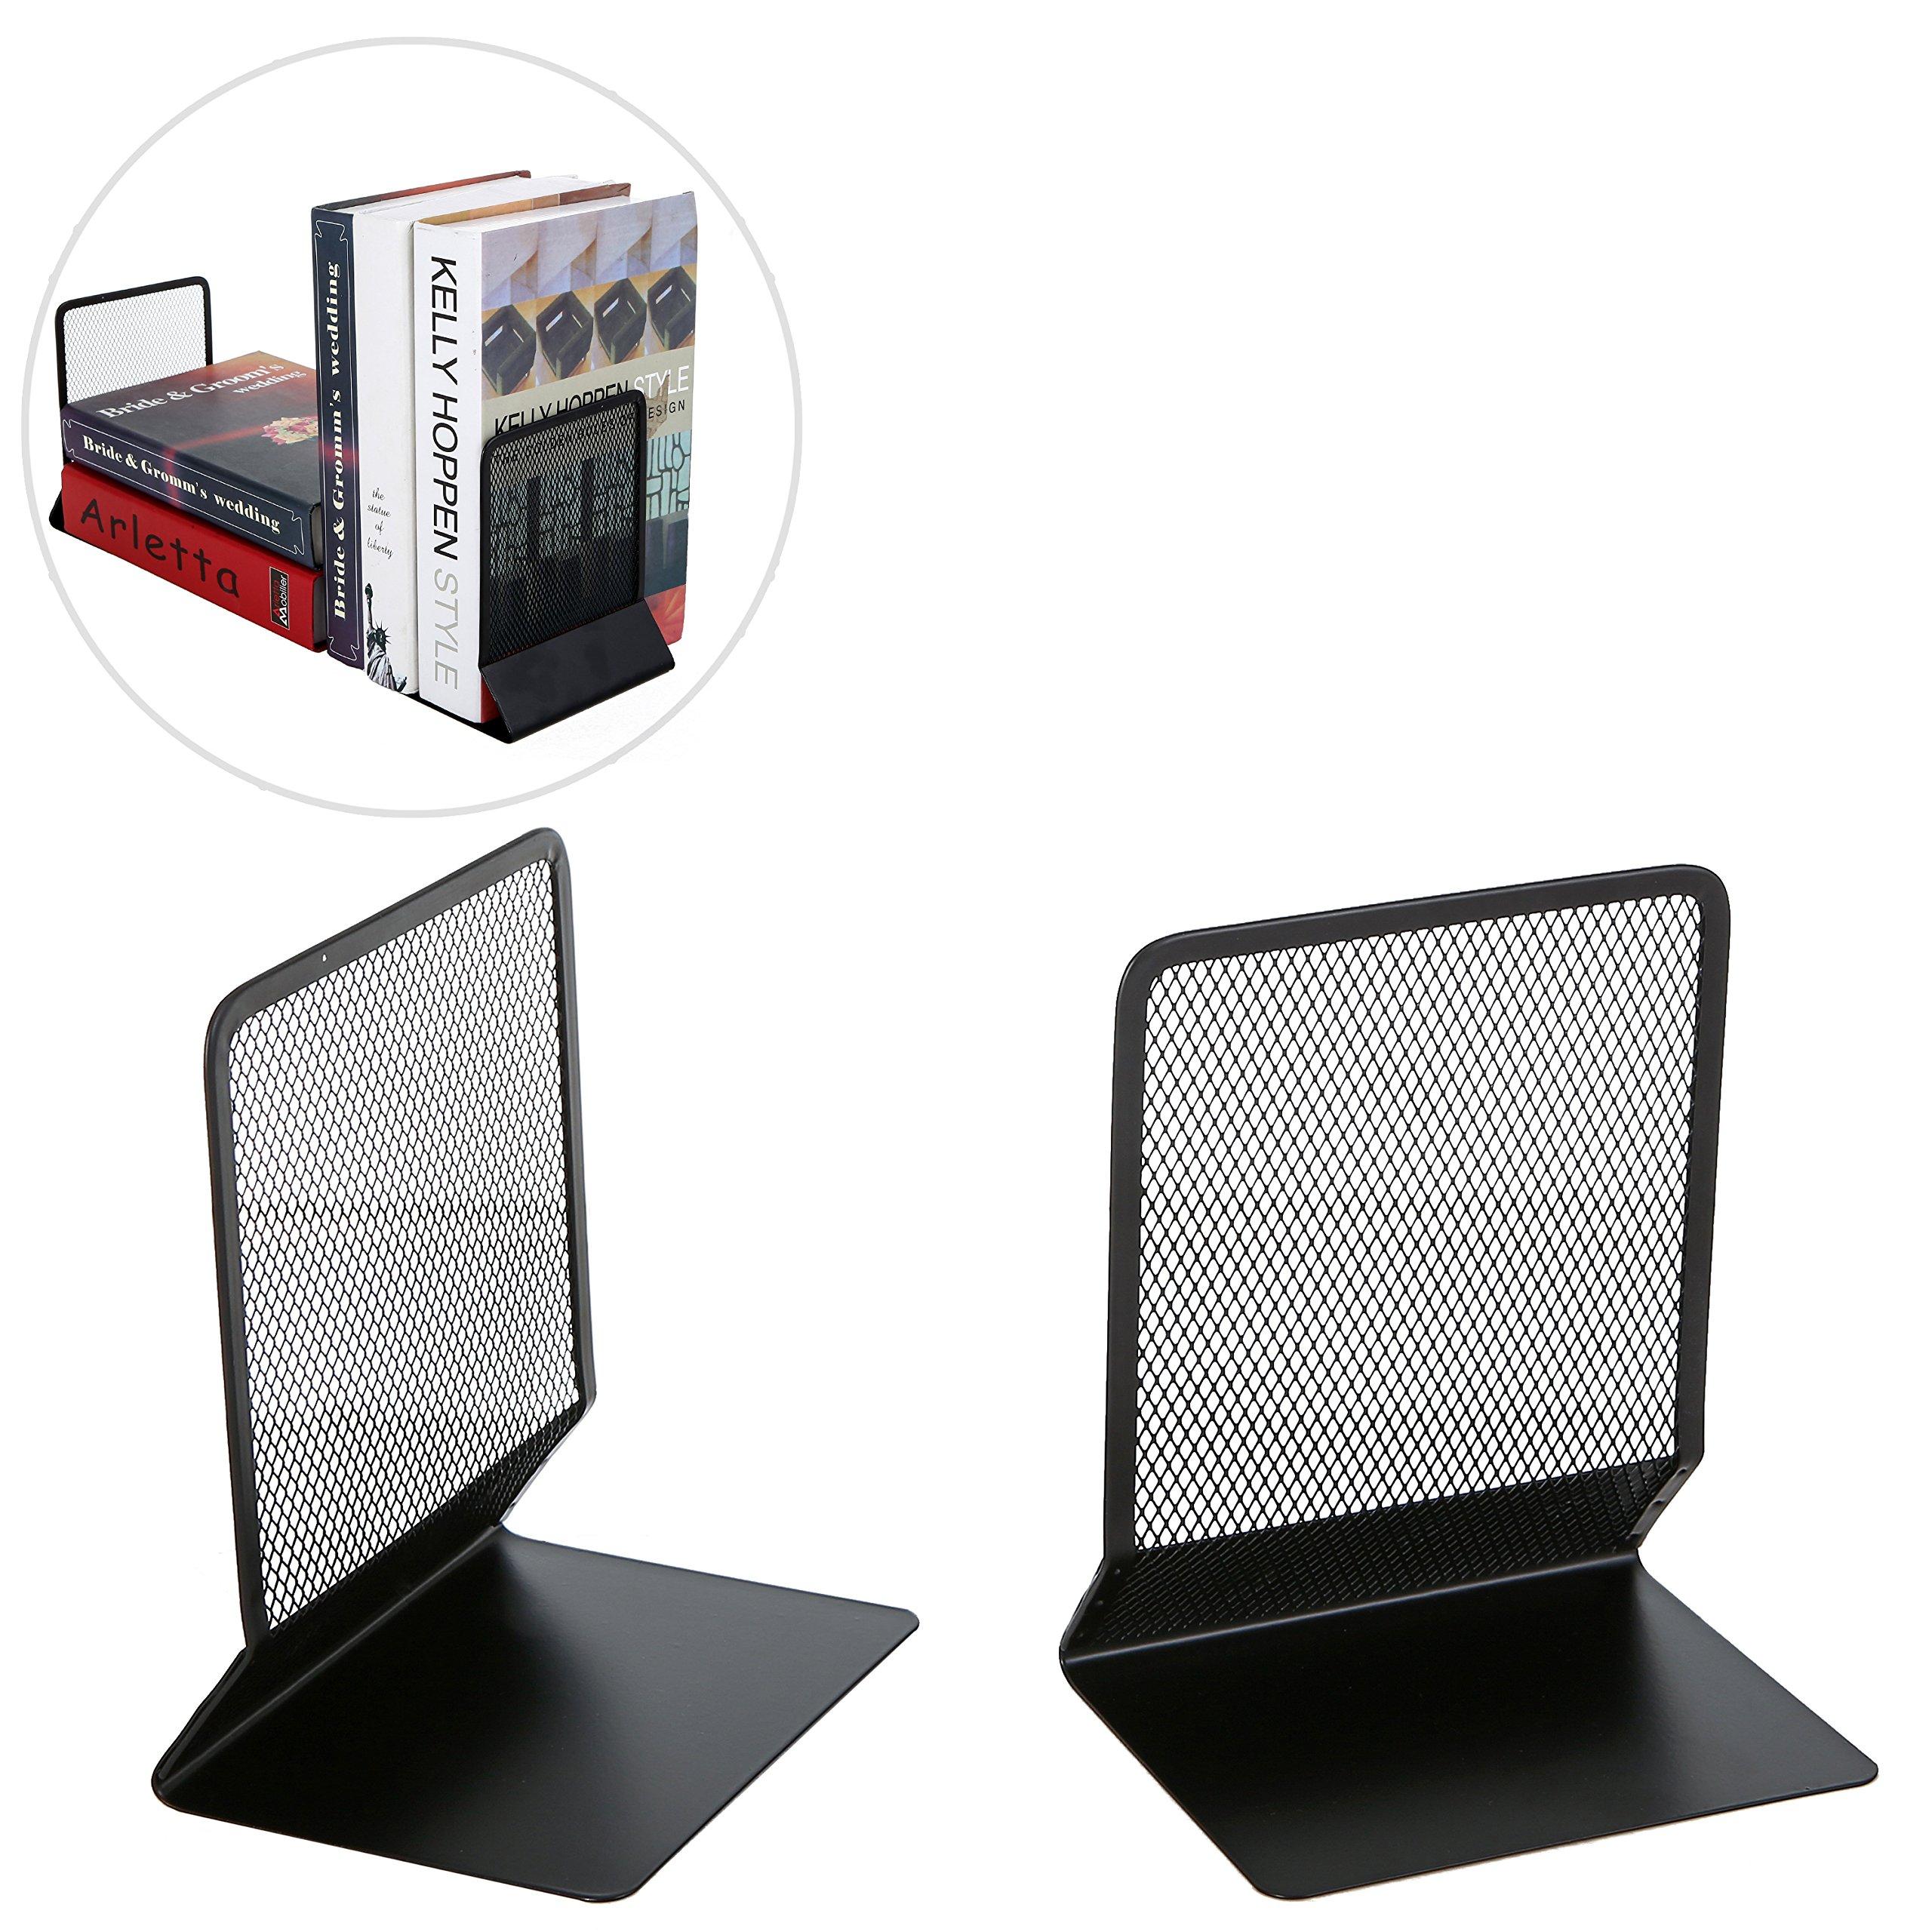 MyGift Modern Metal Mesh Bookends, 2 Piece Desktop Book Holder Rack Set, Black